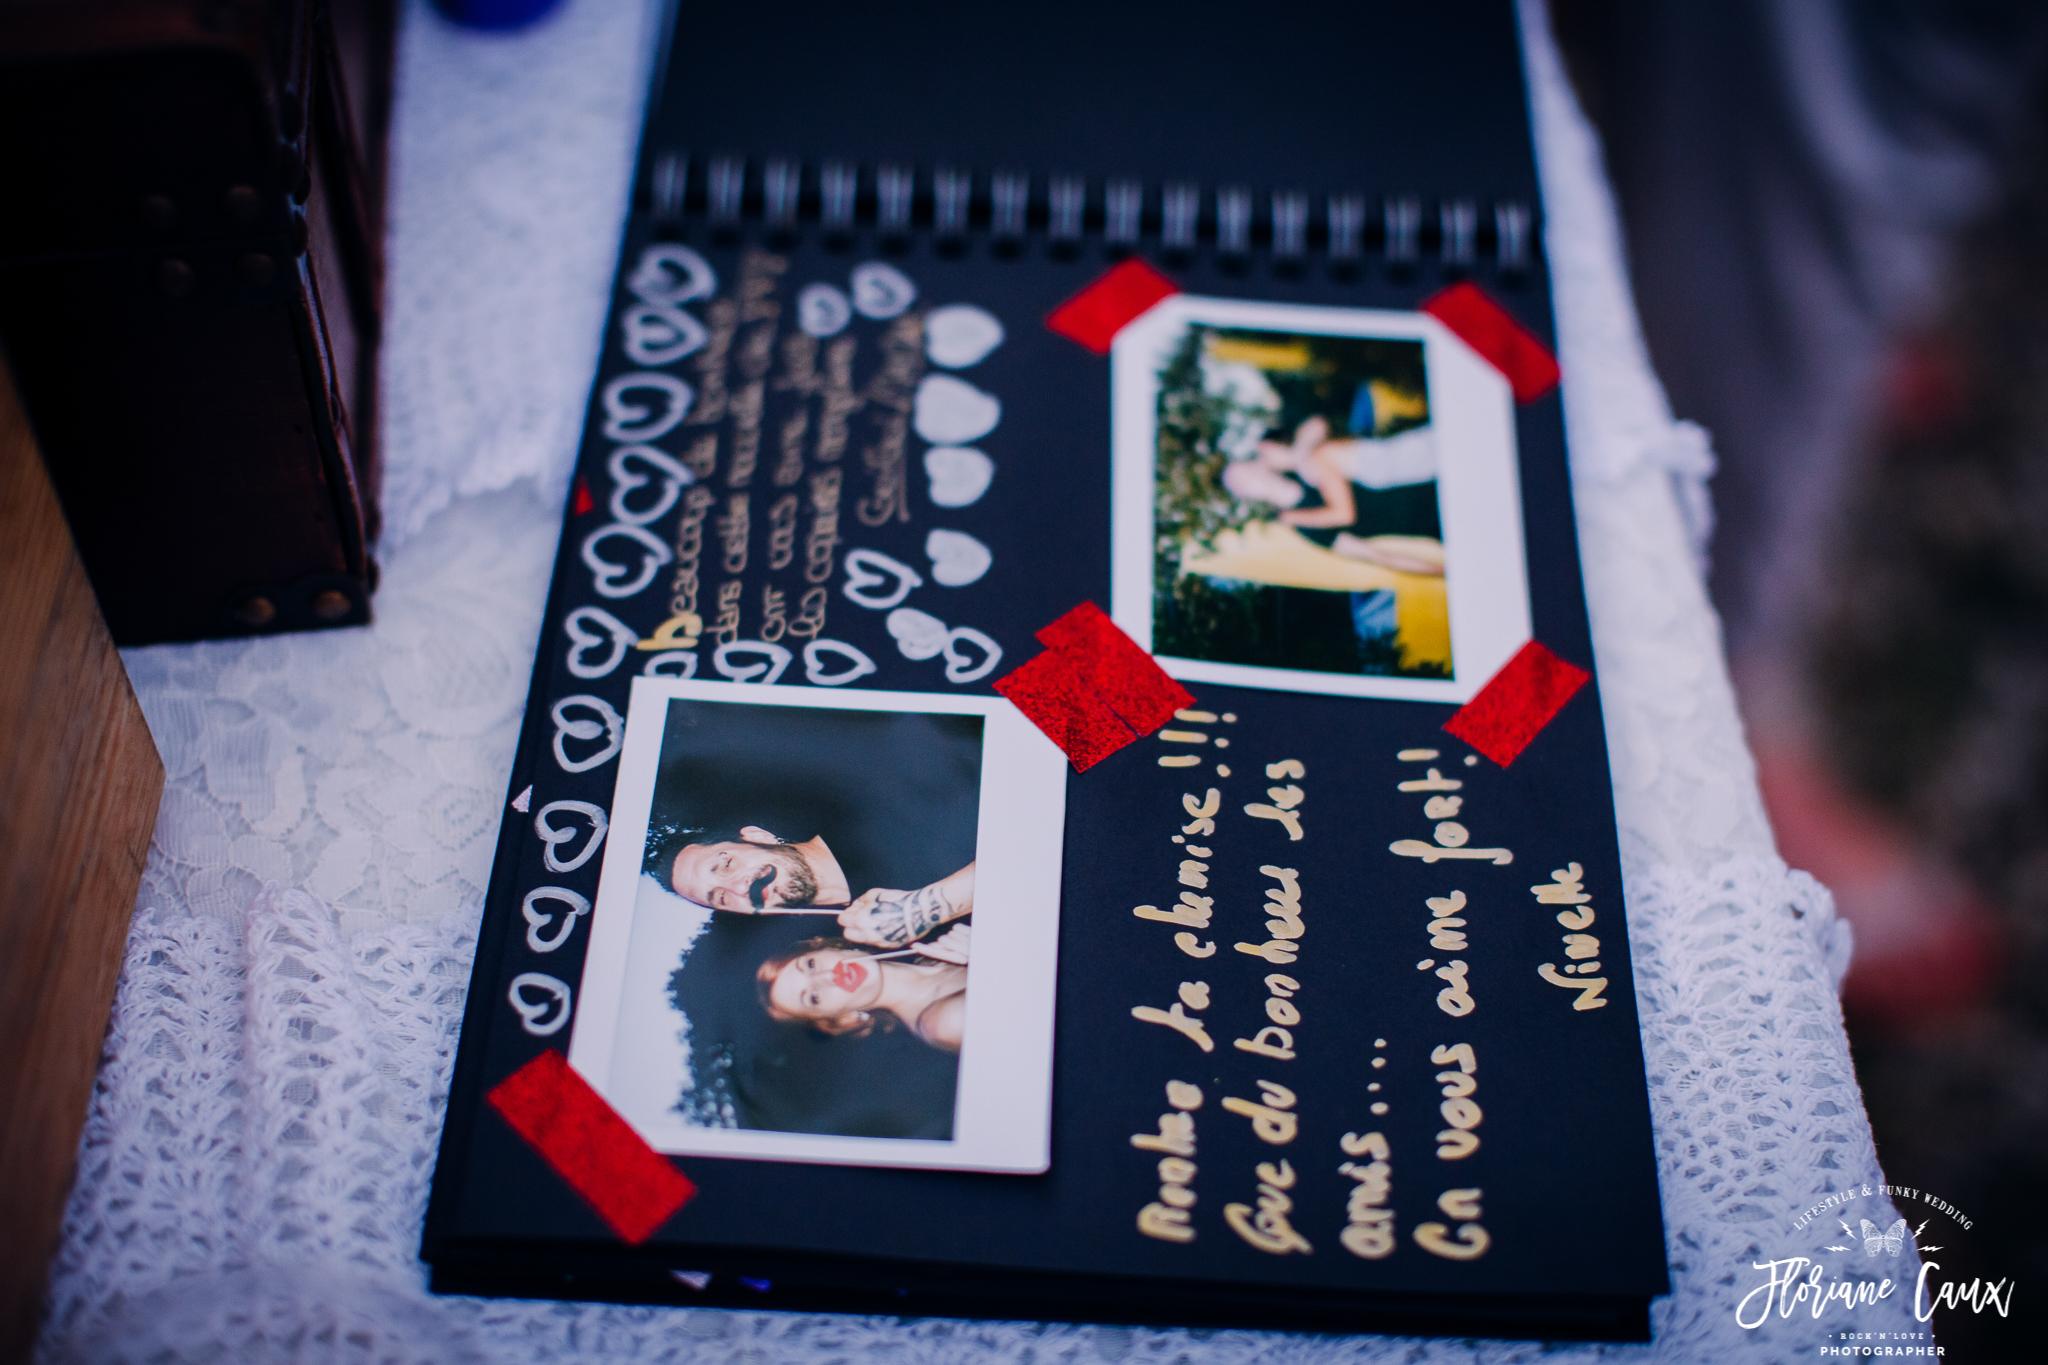 photographe-mariage-toulouse-rocknroll-maries-tatoues-floriane-caux-113